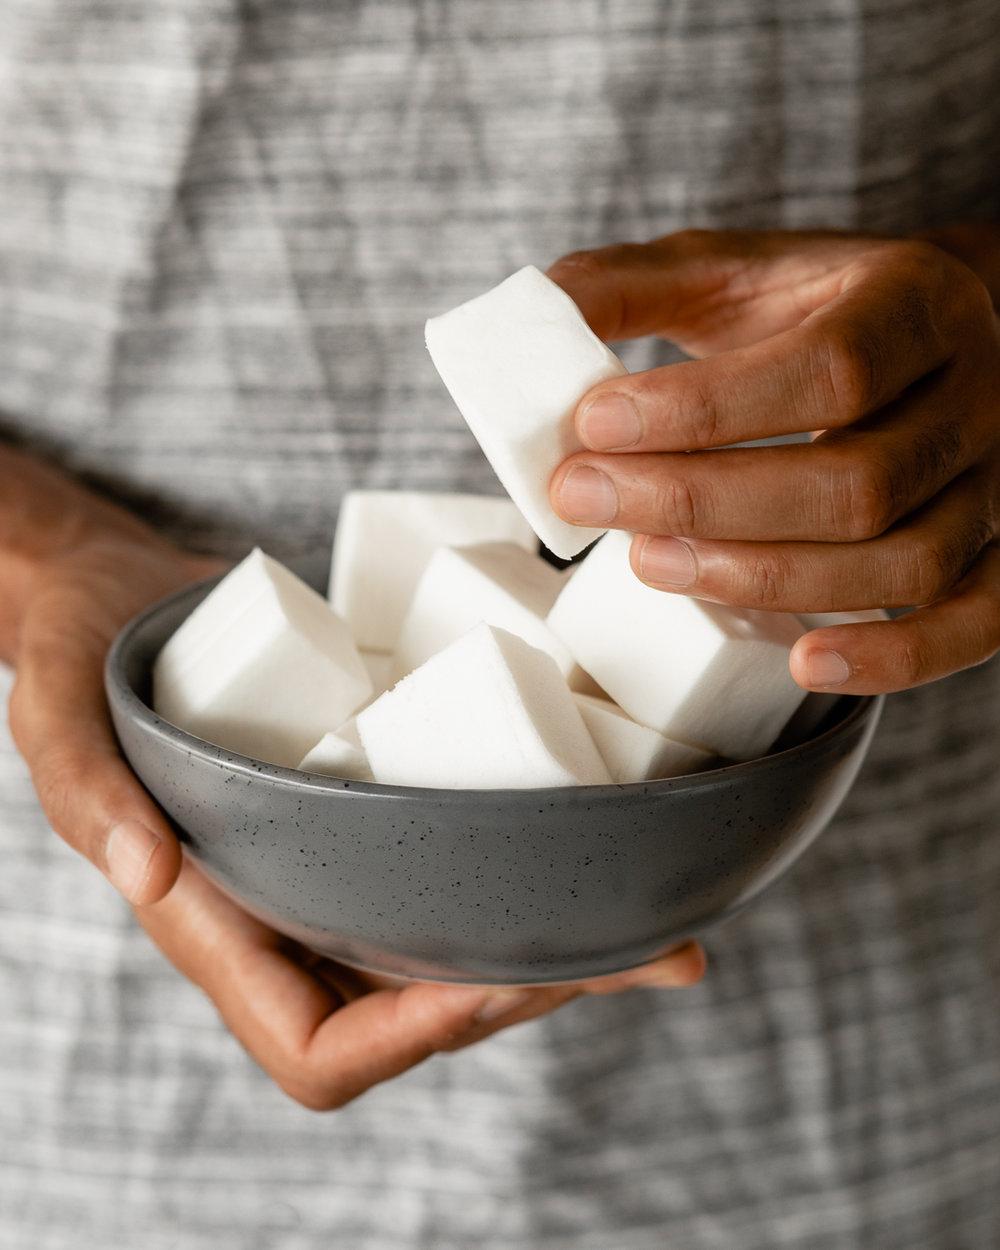 Vanillamarshmallow_by_Jordan_Pie_Nutritionist_Photographer-1.jpg